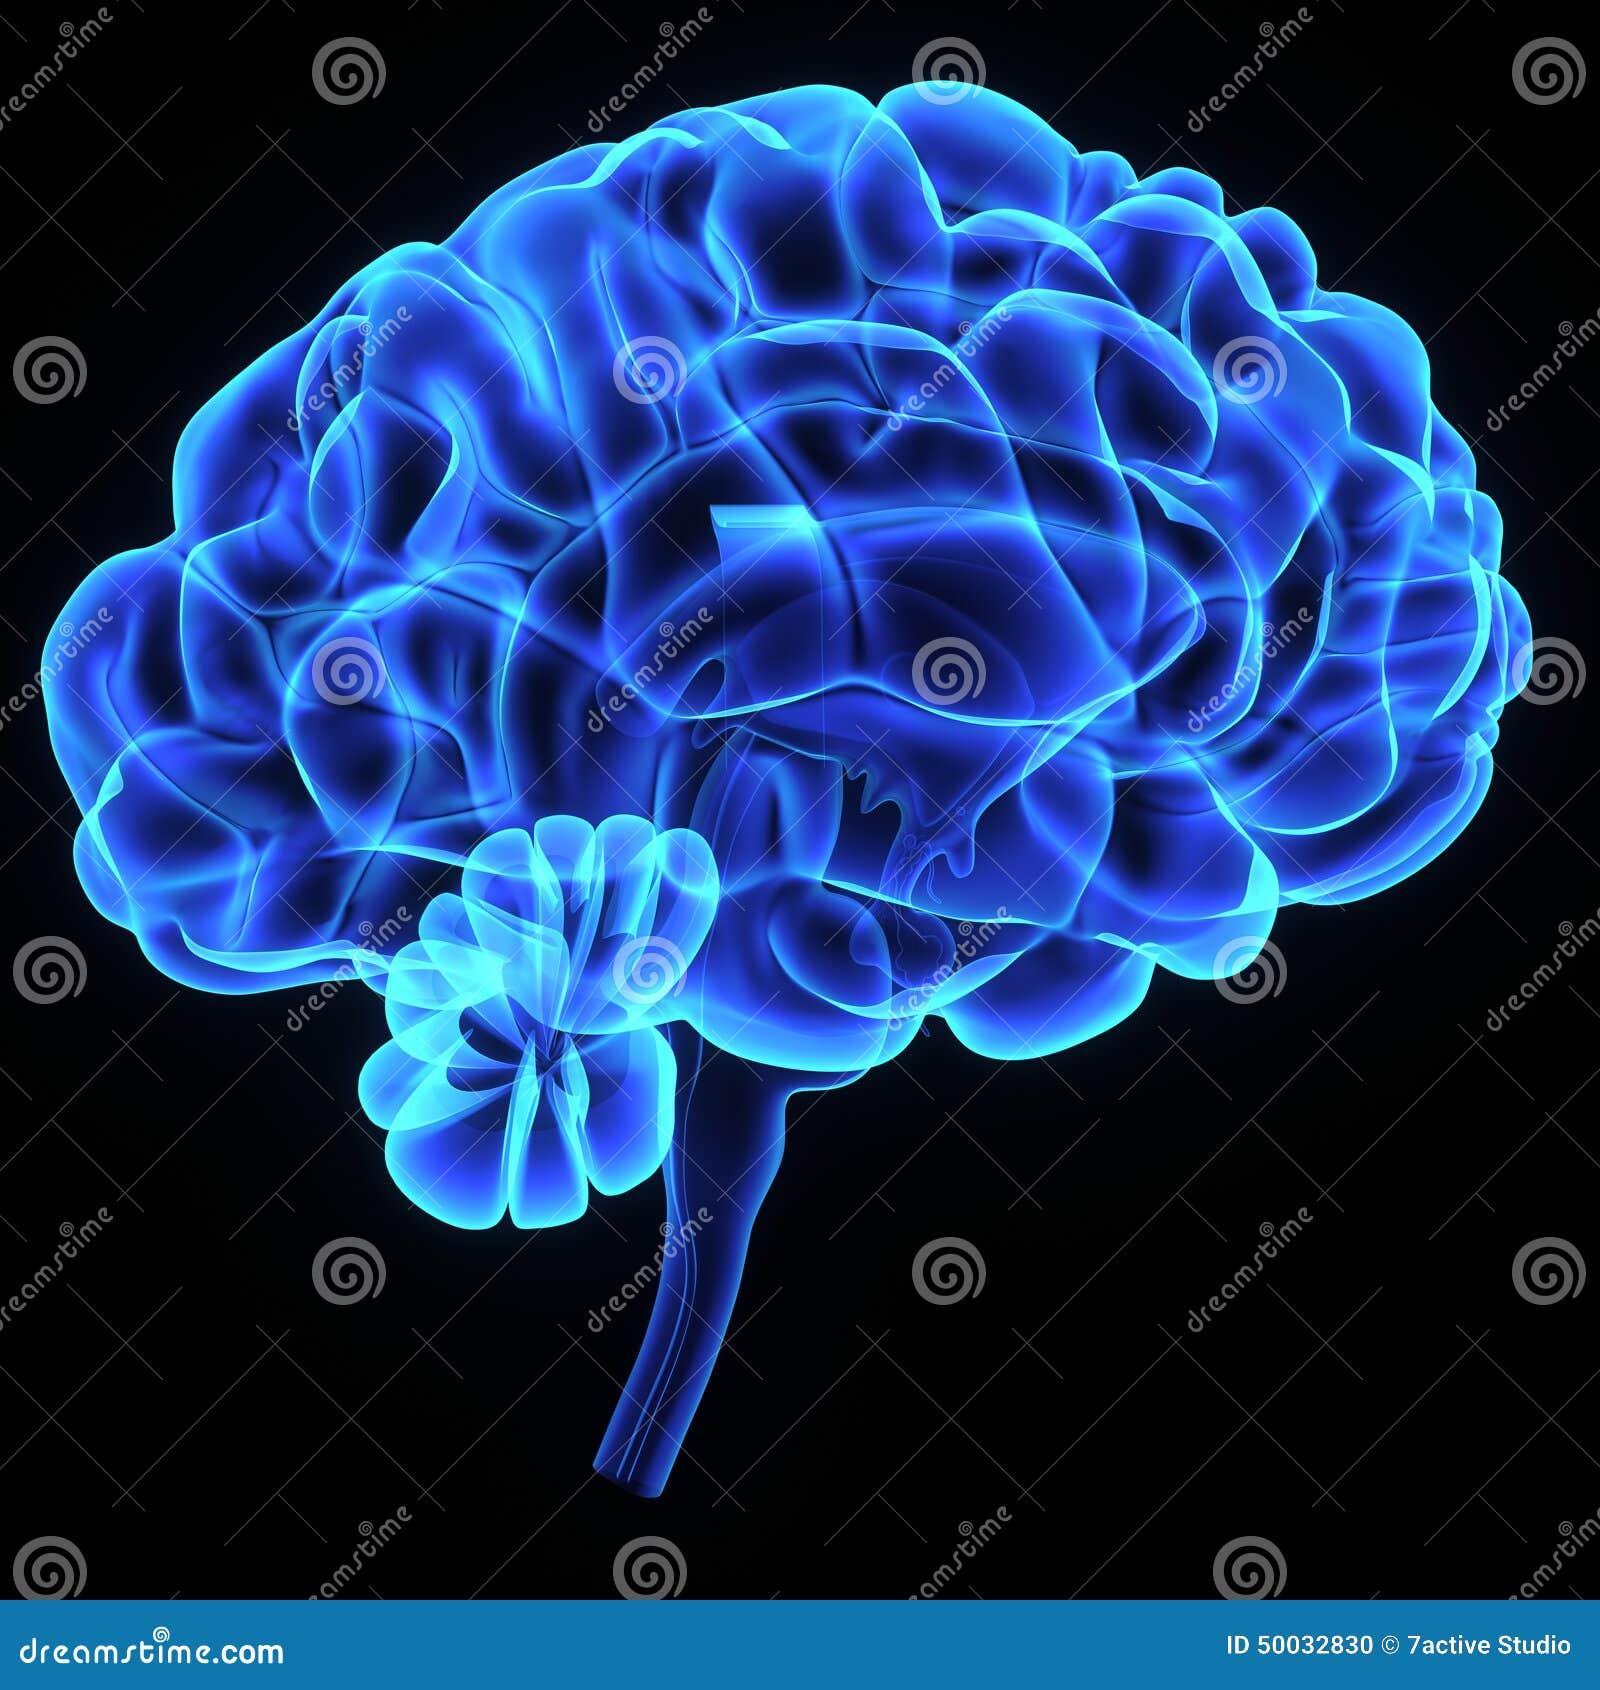 Human brain stock illustration illustration of left 50032830 download human brain stock illustration illustration of left 50032830 ccuart Images